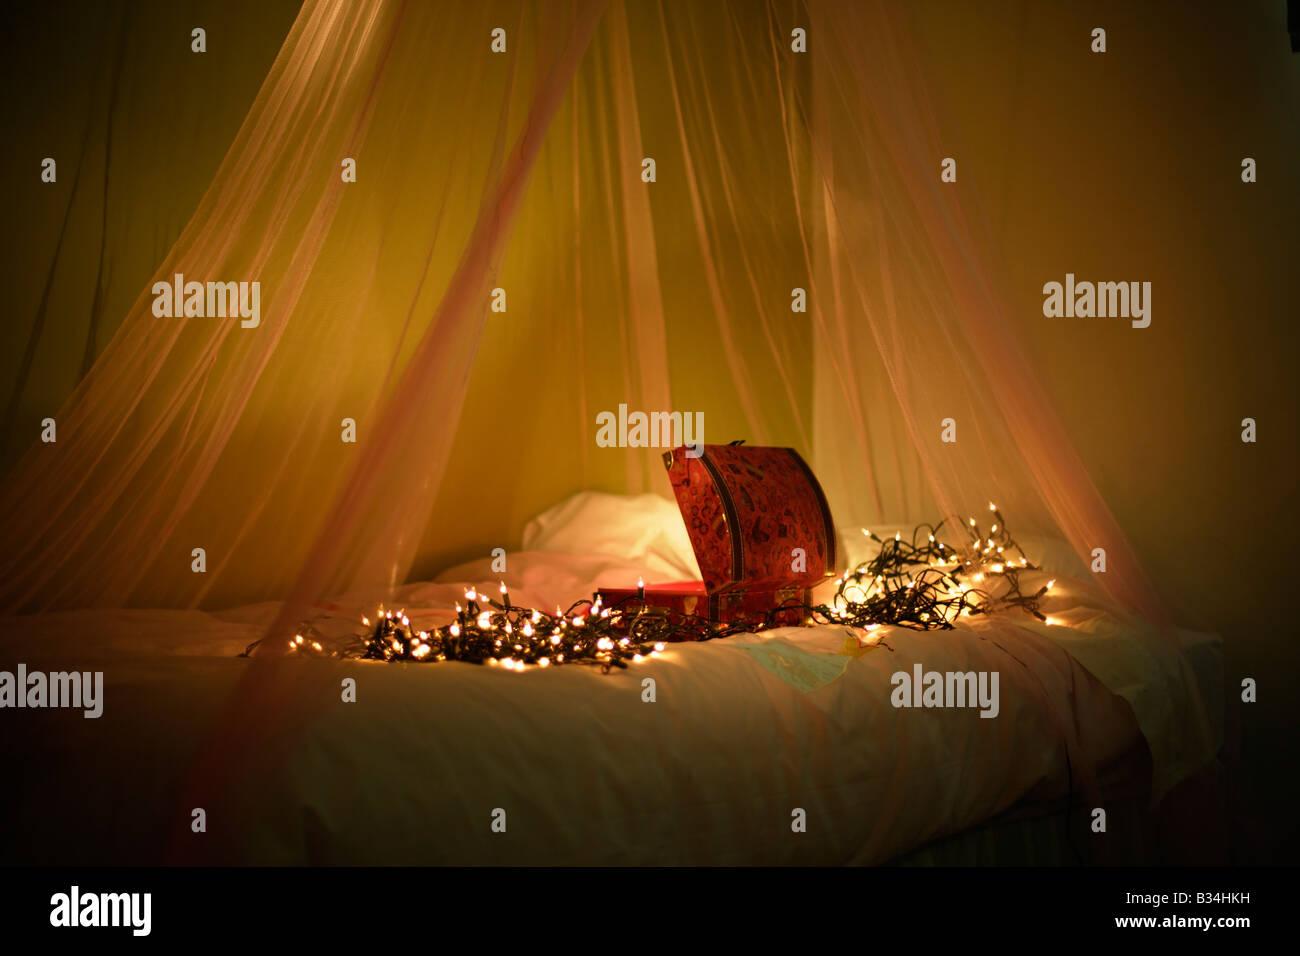 magical stockfotos magical bilder alamy. Black Bedroom Furniture Sets. Home Design Ideas